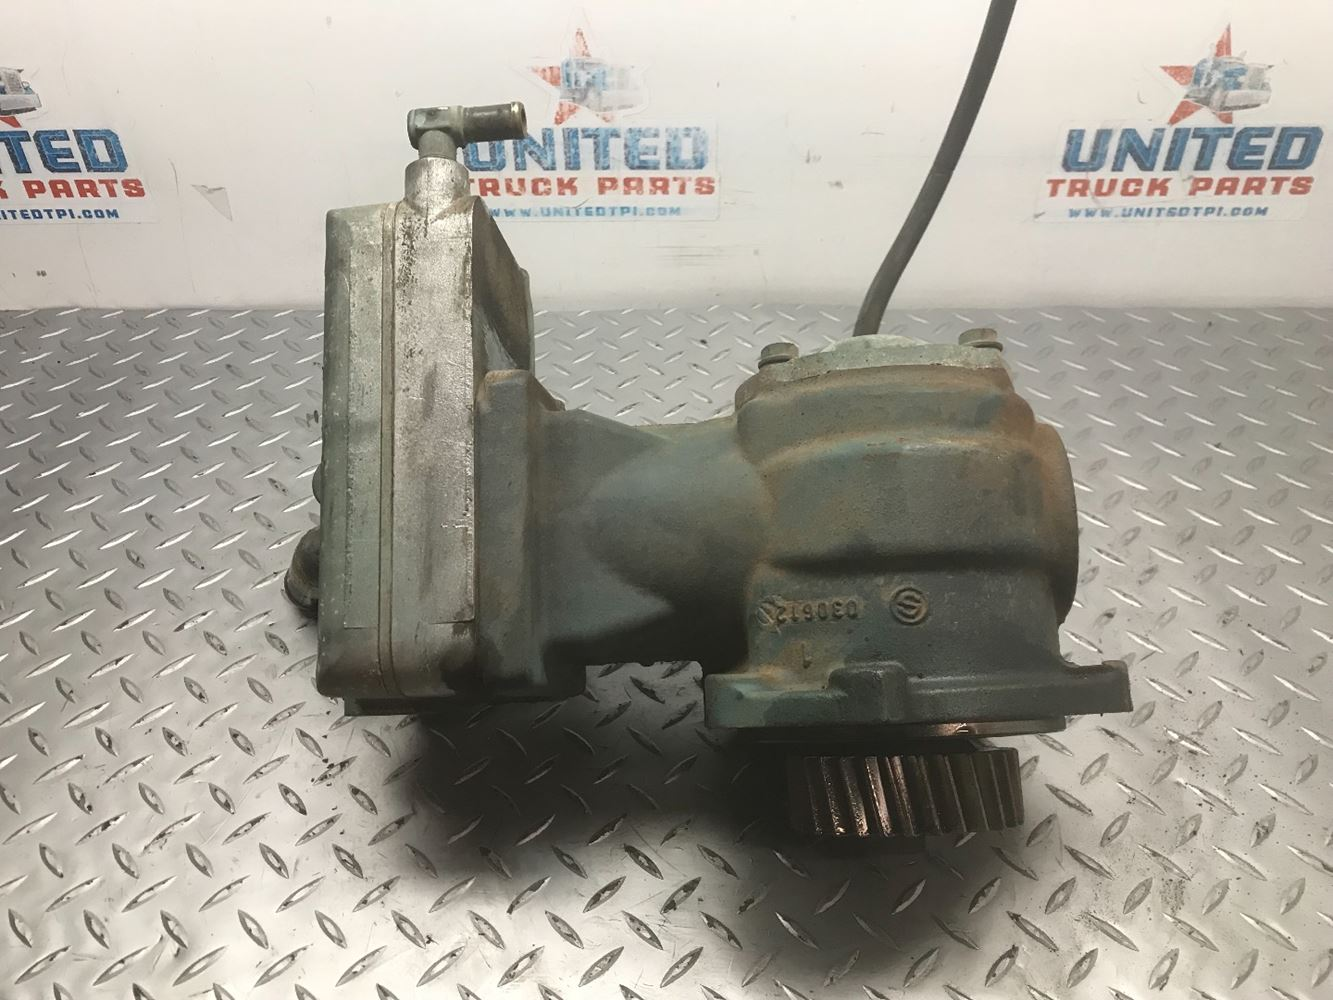 Engines & Engine Parts | United Truck Parts Inc